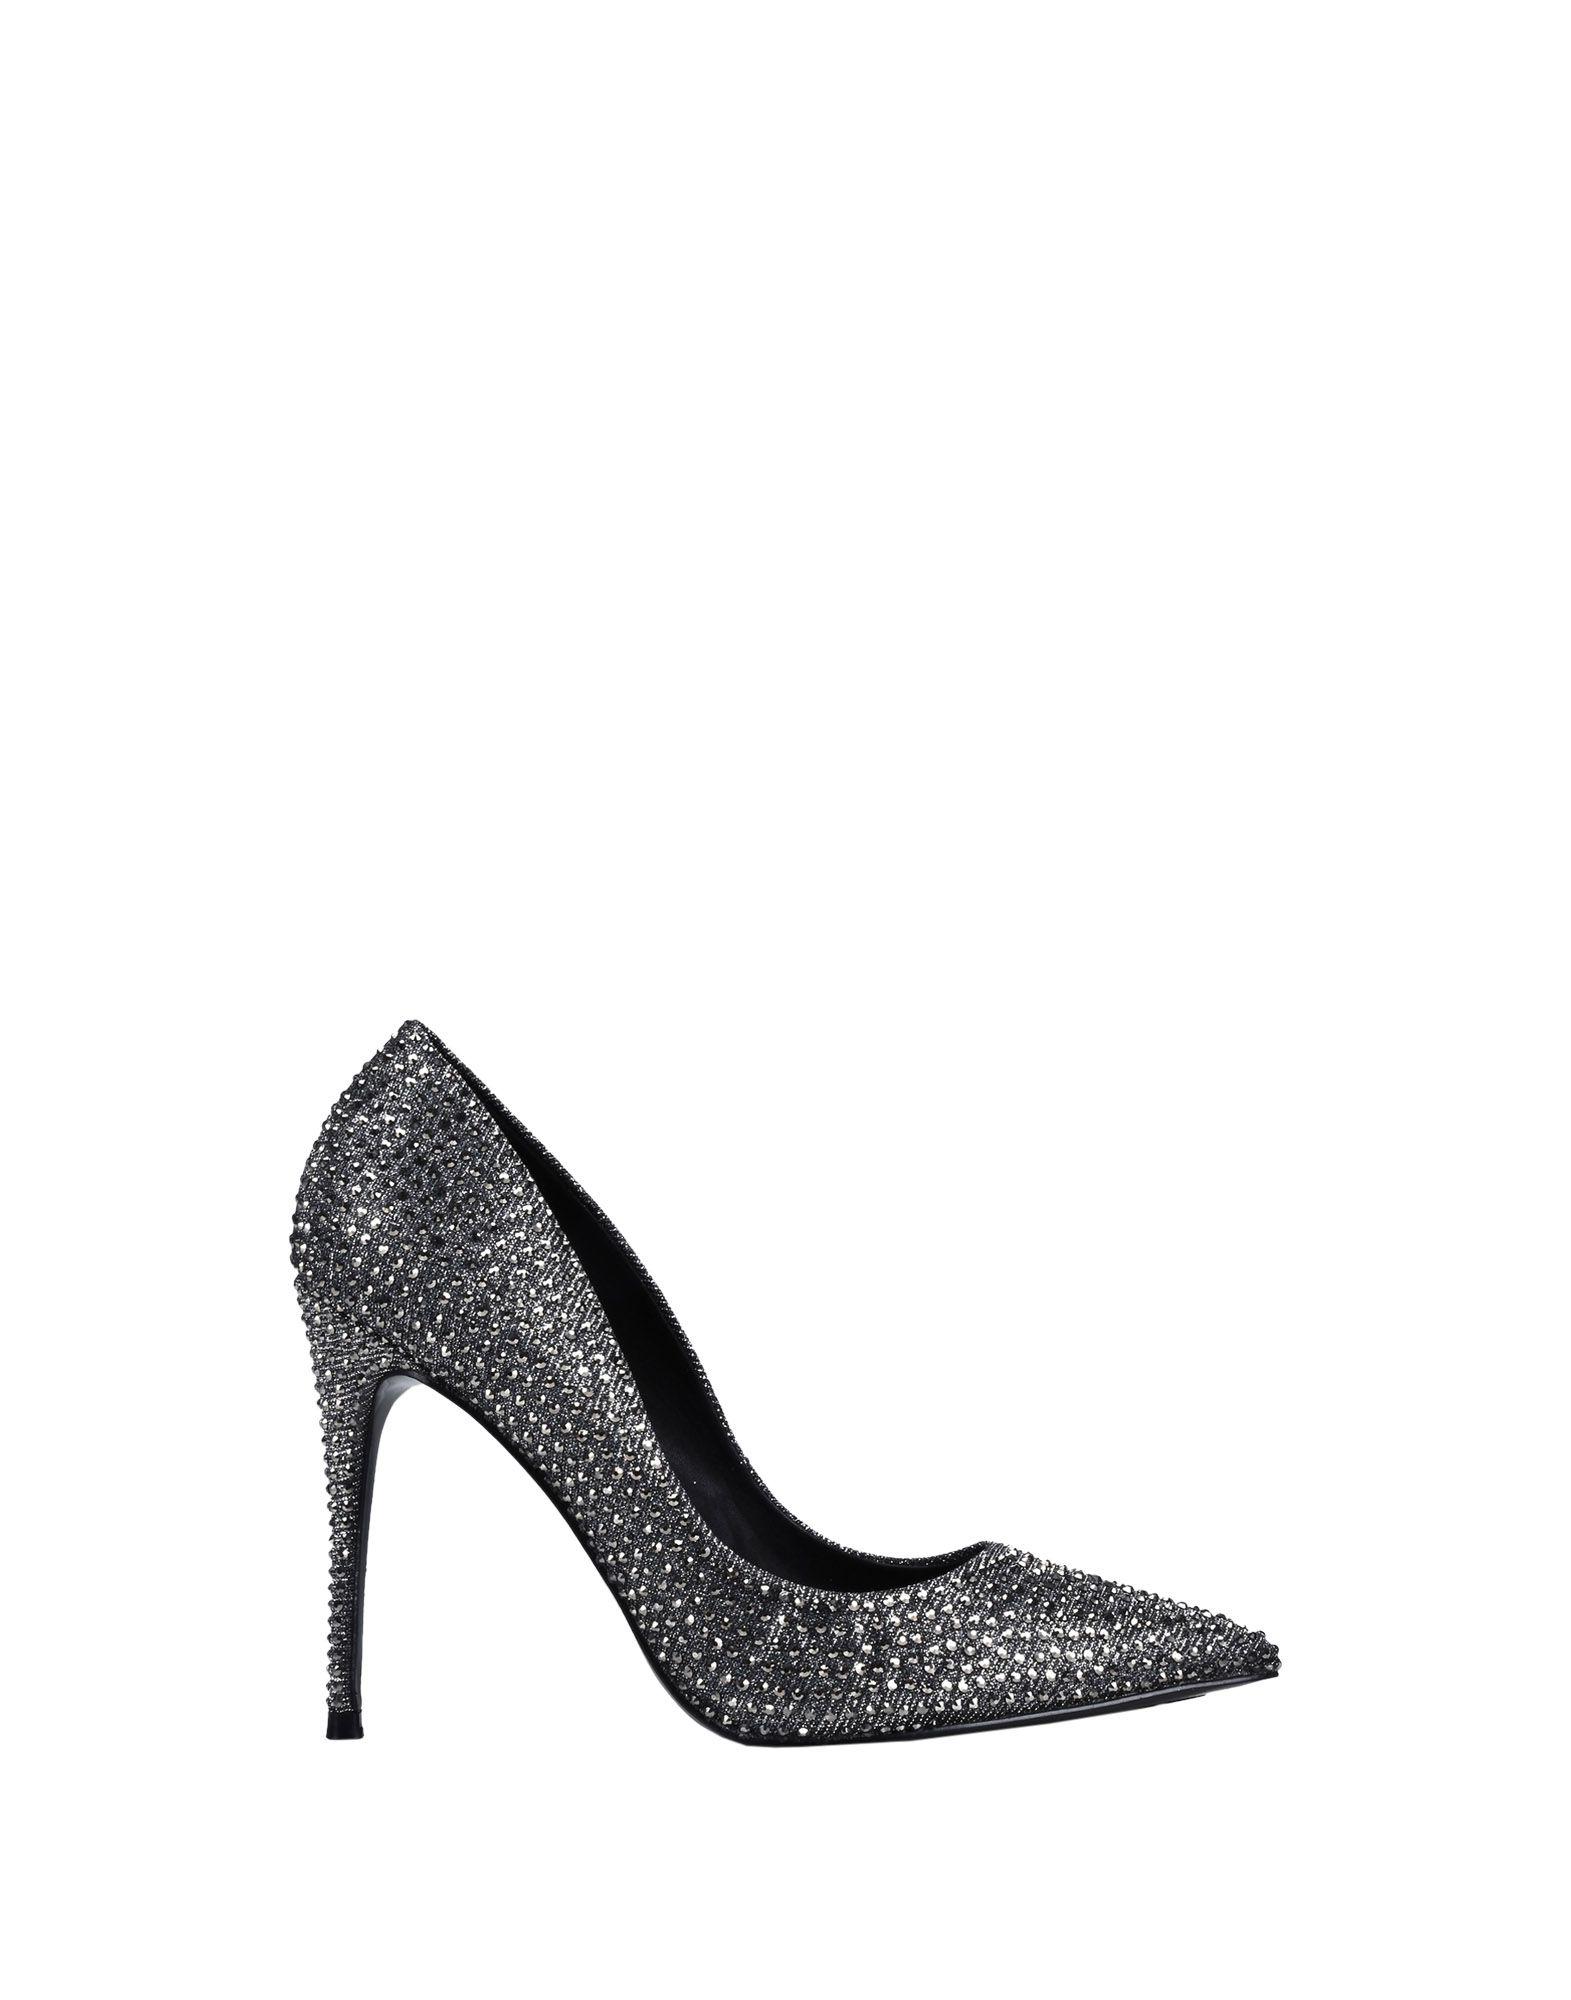 Steve Madden Daisie Schuhe 11492978HV Gute Qualität beliebte Schuhe Daisie 58a94a